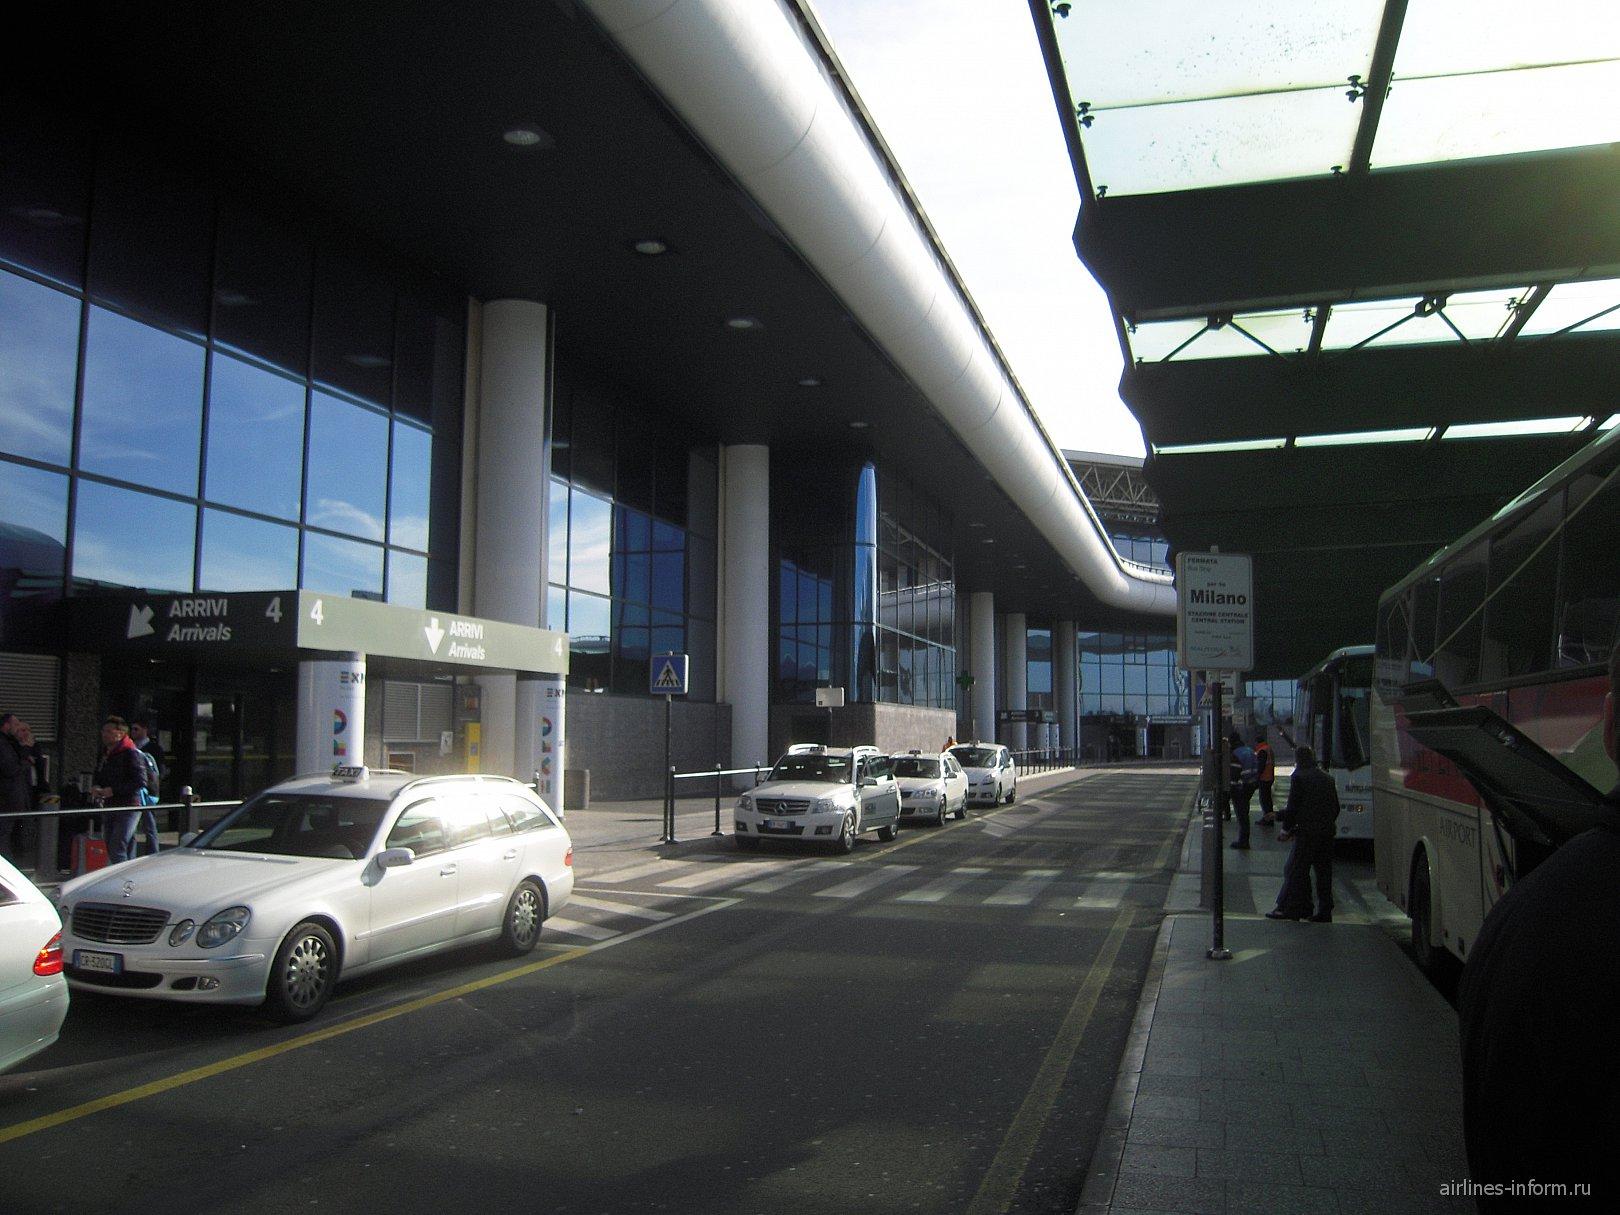 Стоянки такси в аэропорту Милан Мальпенса